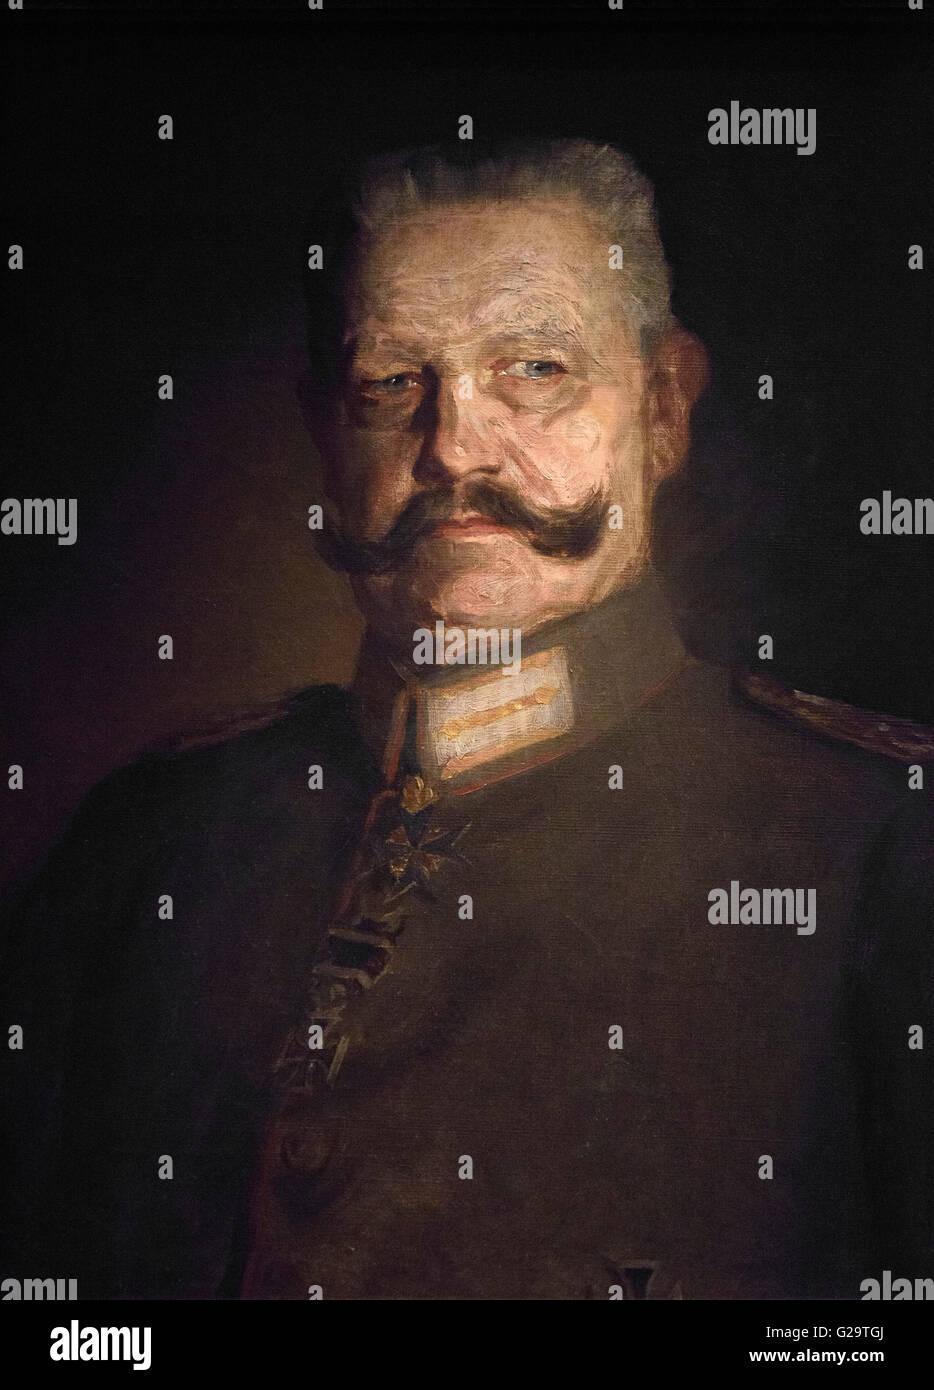 Walter Petersen (1862-1950), Portrait of Field Marshal Paul von Hindenburg (1847-1934), Germany 1916. - Stock Image